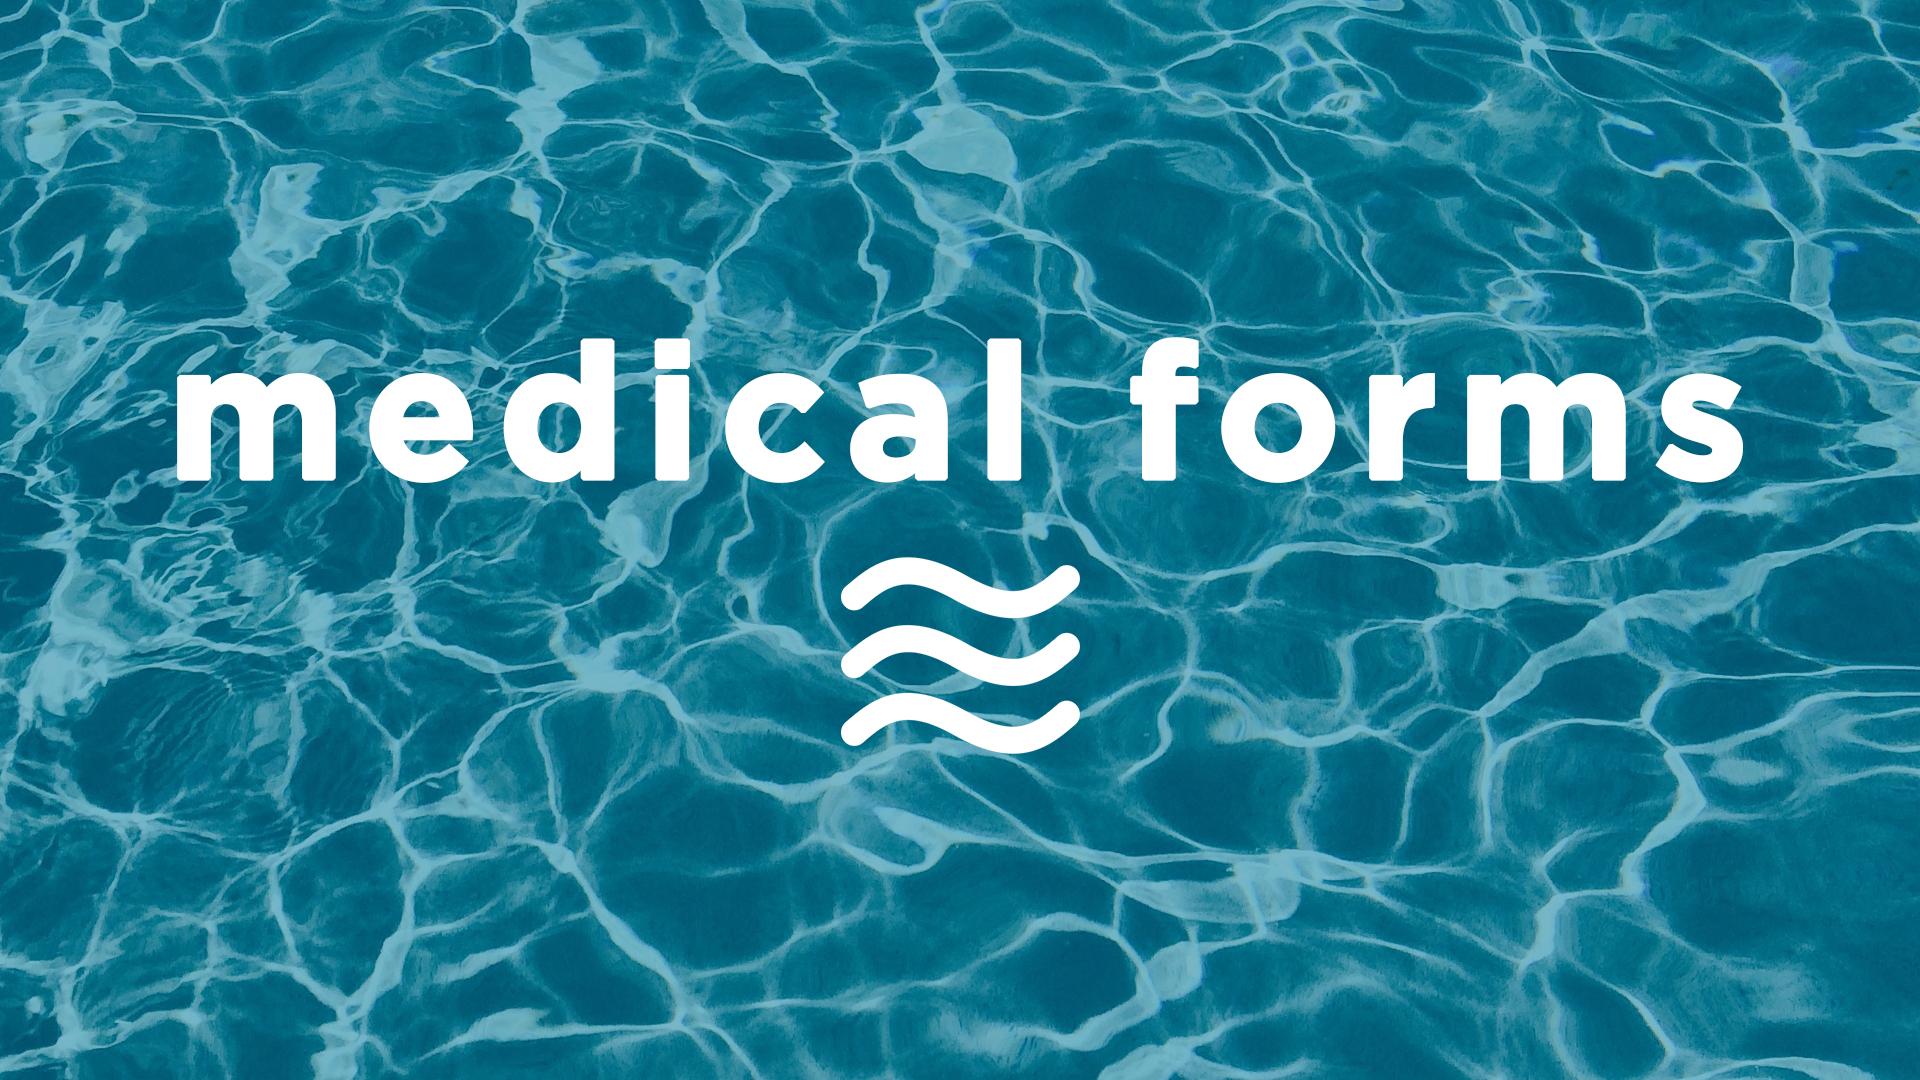 medicalforms.jpg